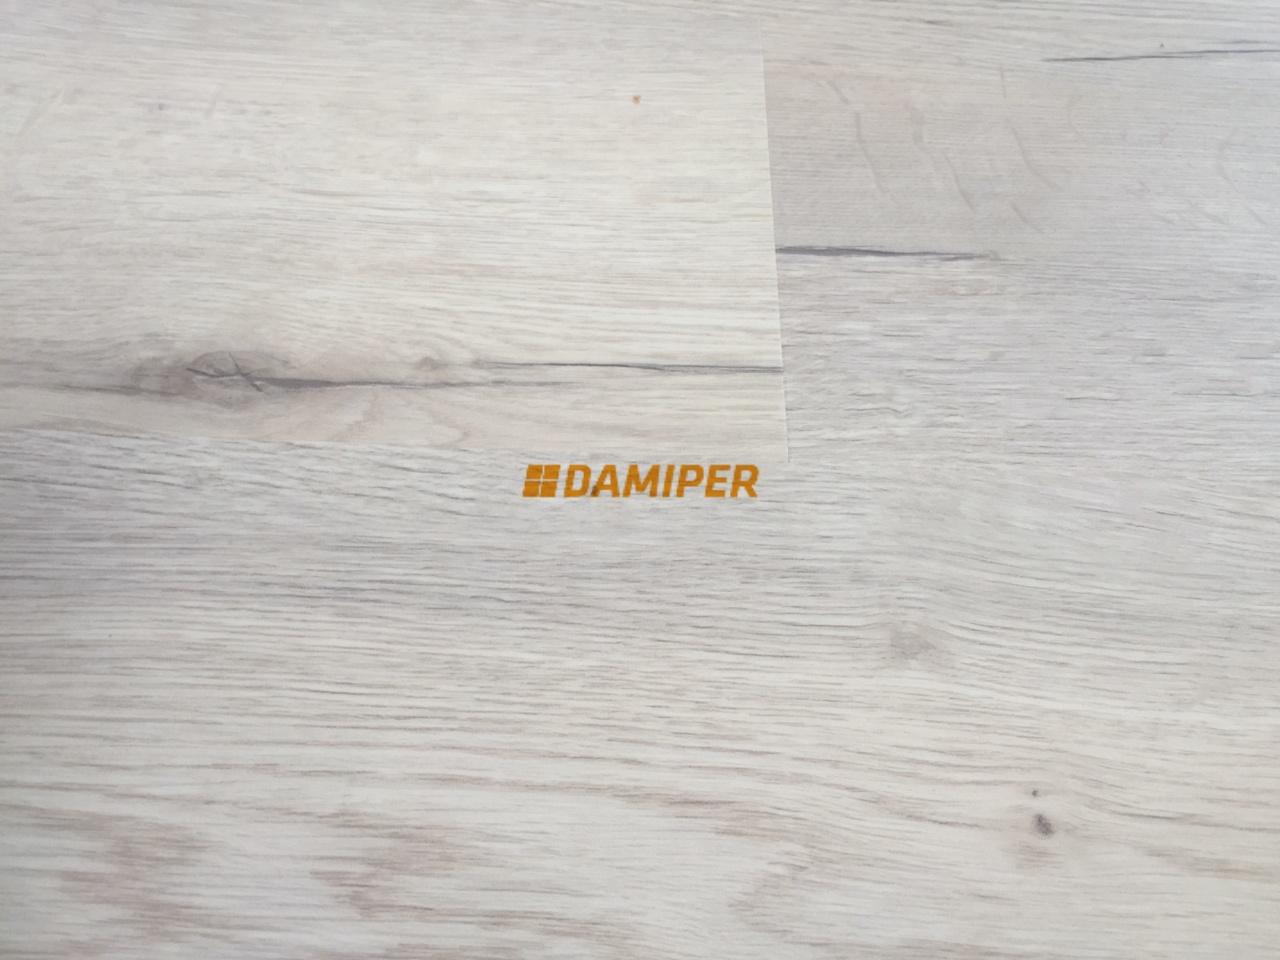 kompozitne_podlahy_egger_greentec_ehd013_dub_monfort_biely_damiper